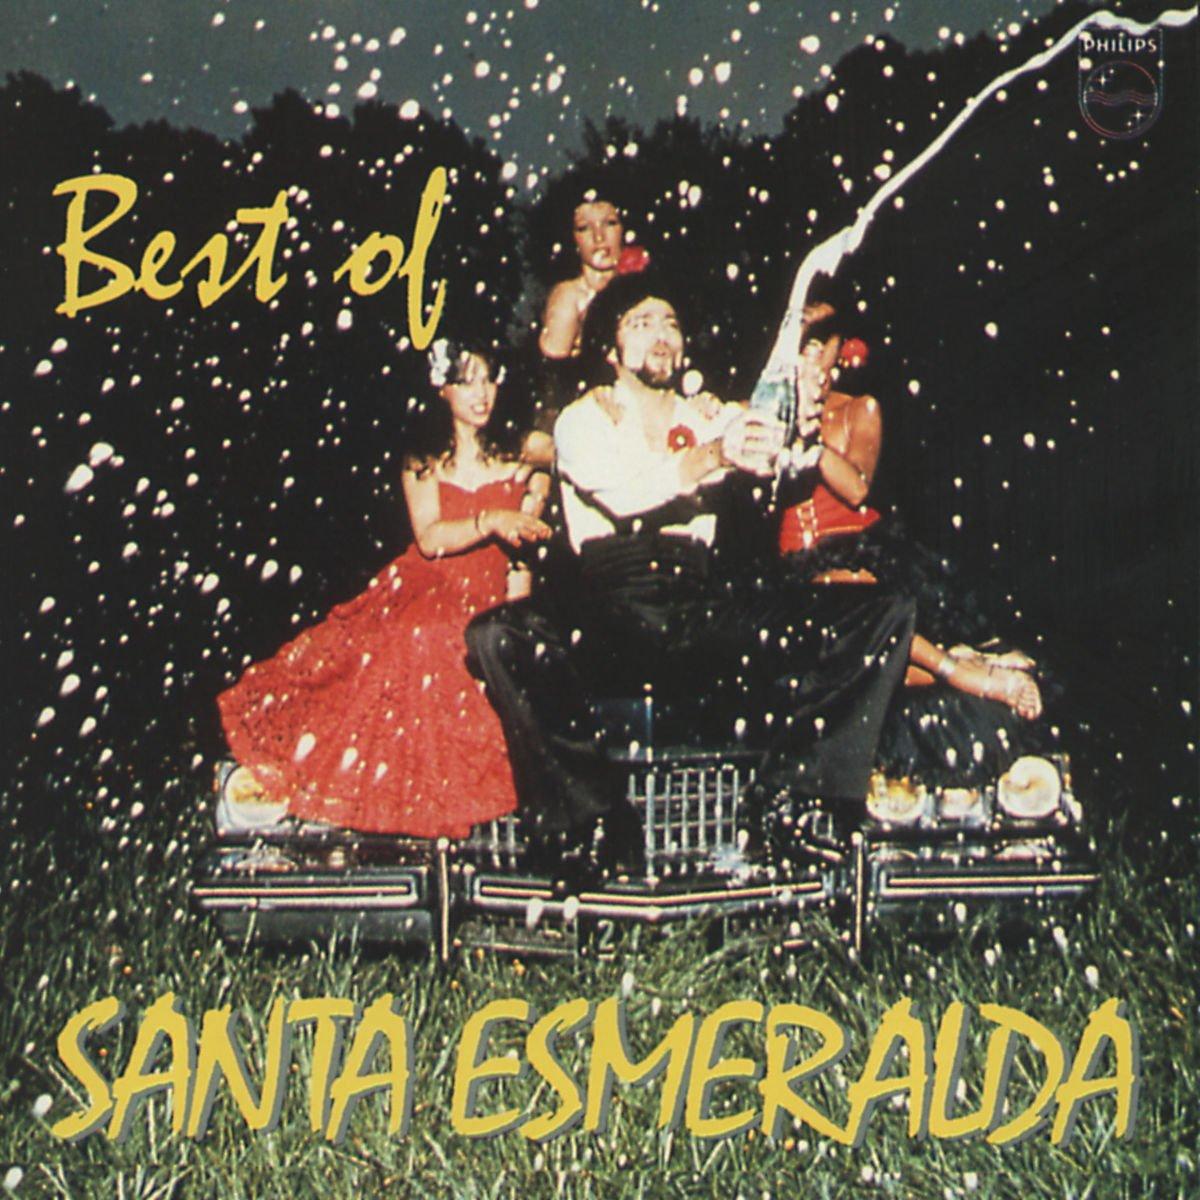 SANTA ESMERALDA - Best of Santa Esmeralda - Amazon.com Music